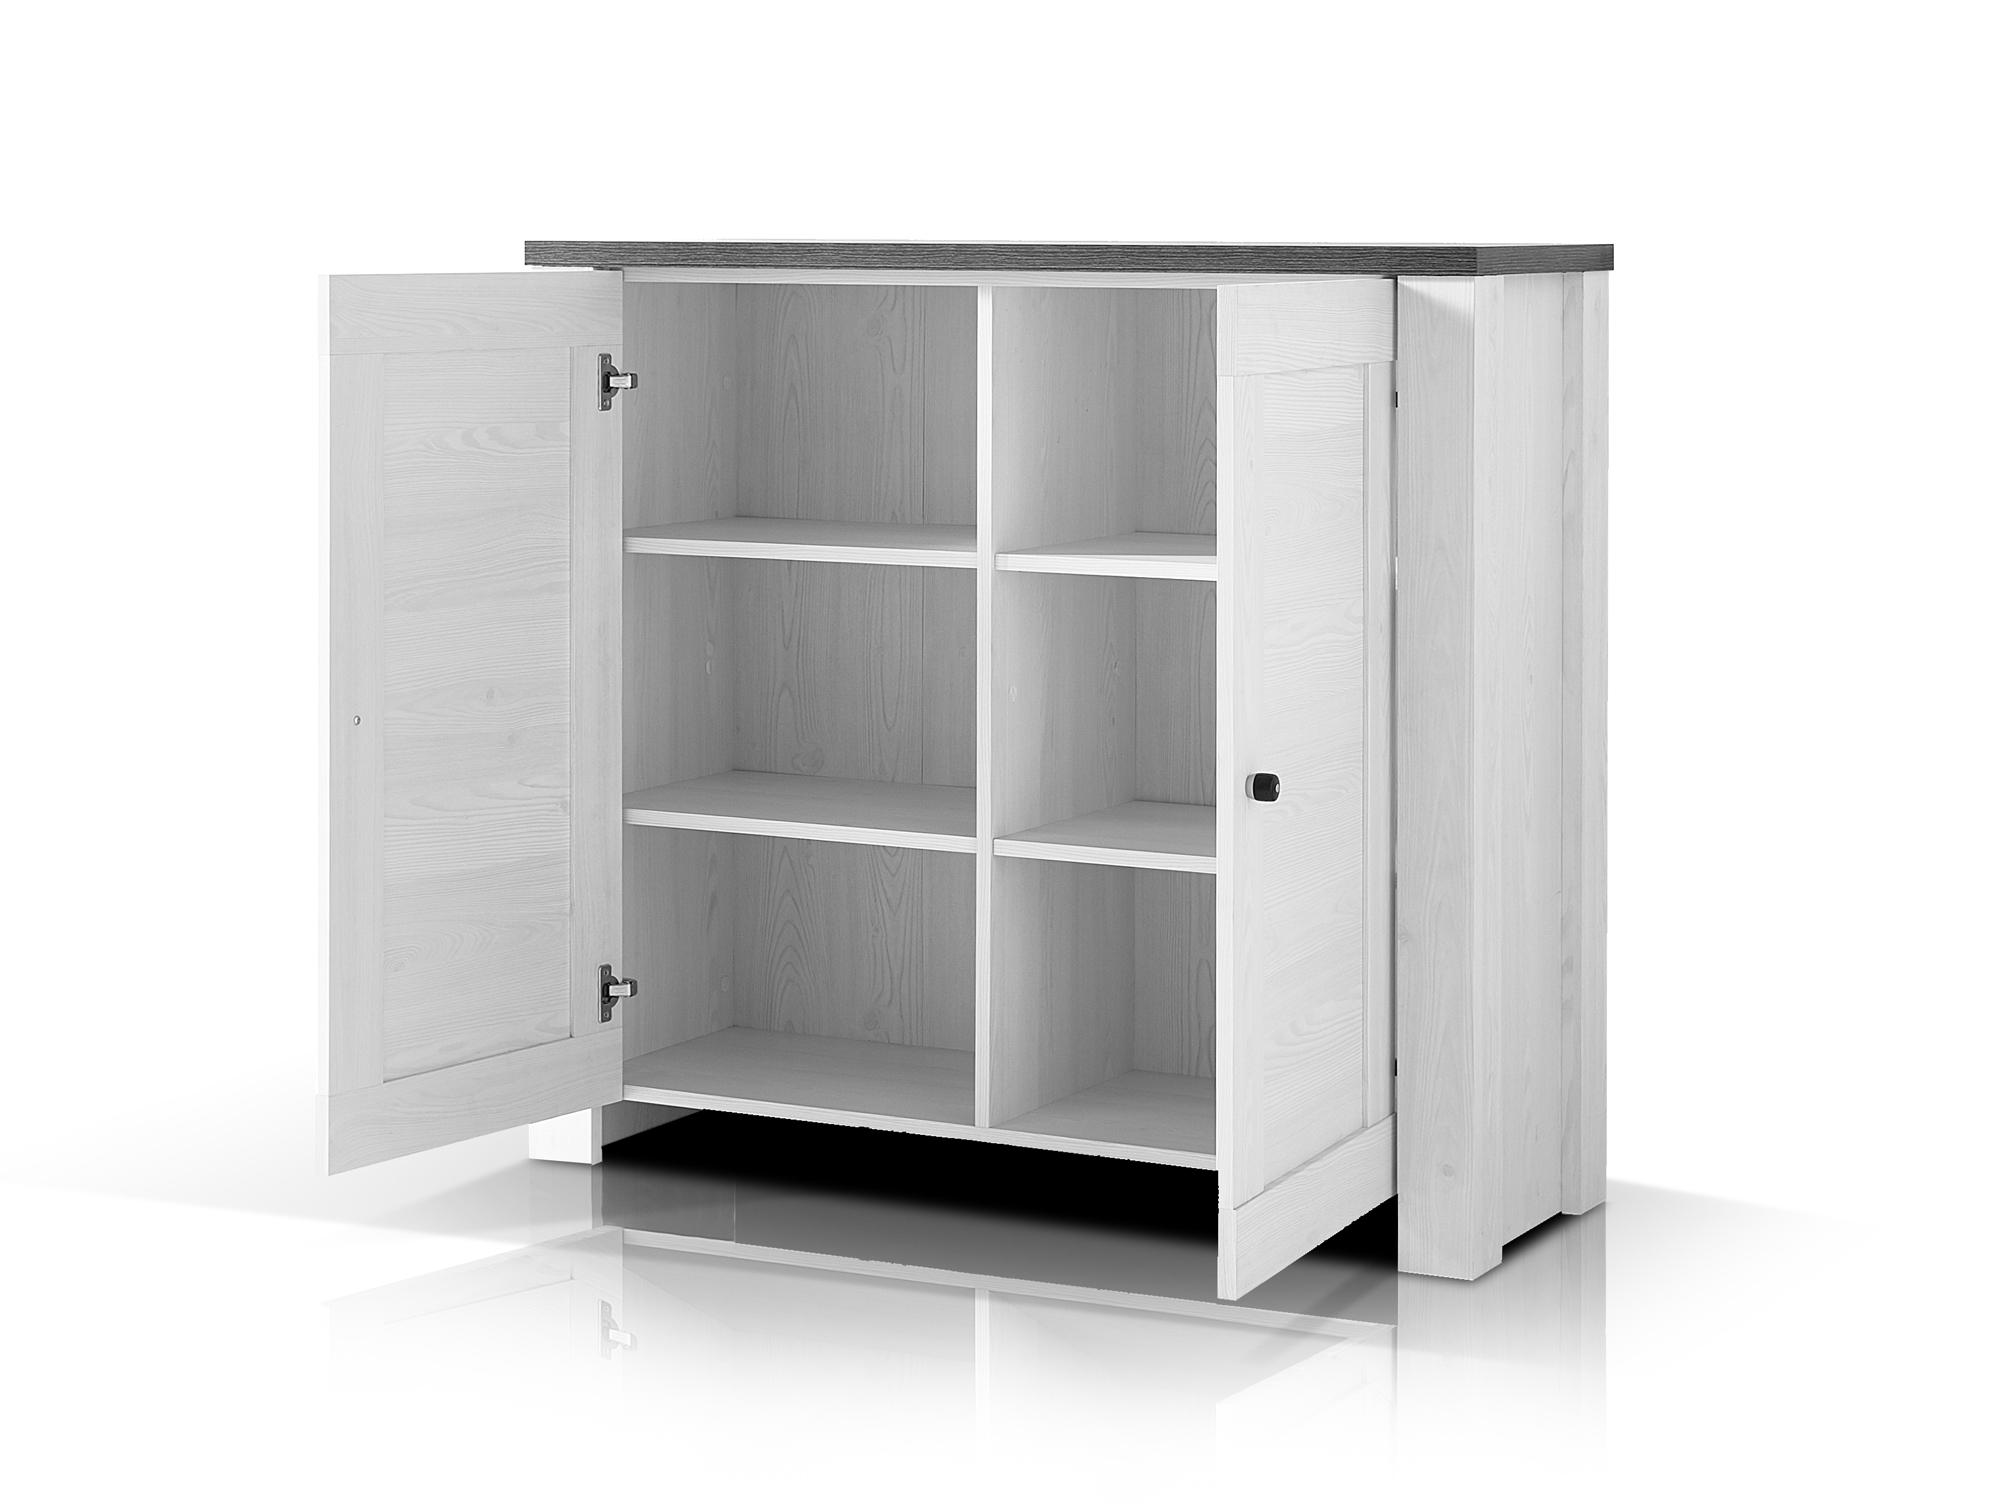 antwerpen ii kommode t ren l rche pinie dunkel. Black Bedroom Furniture Sets. Home Design Ideas